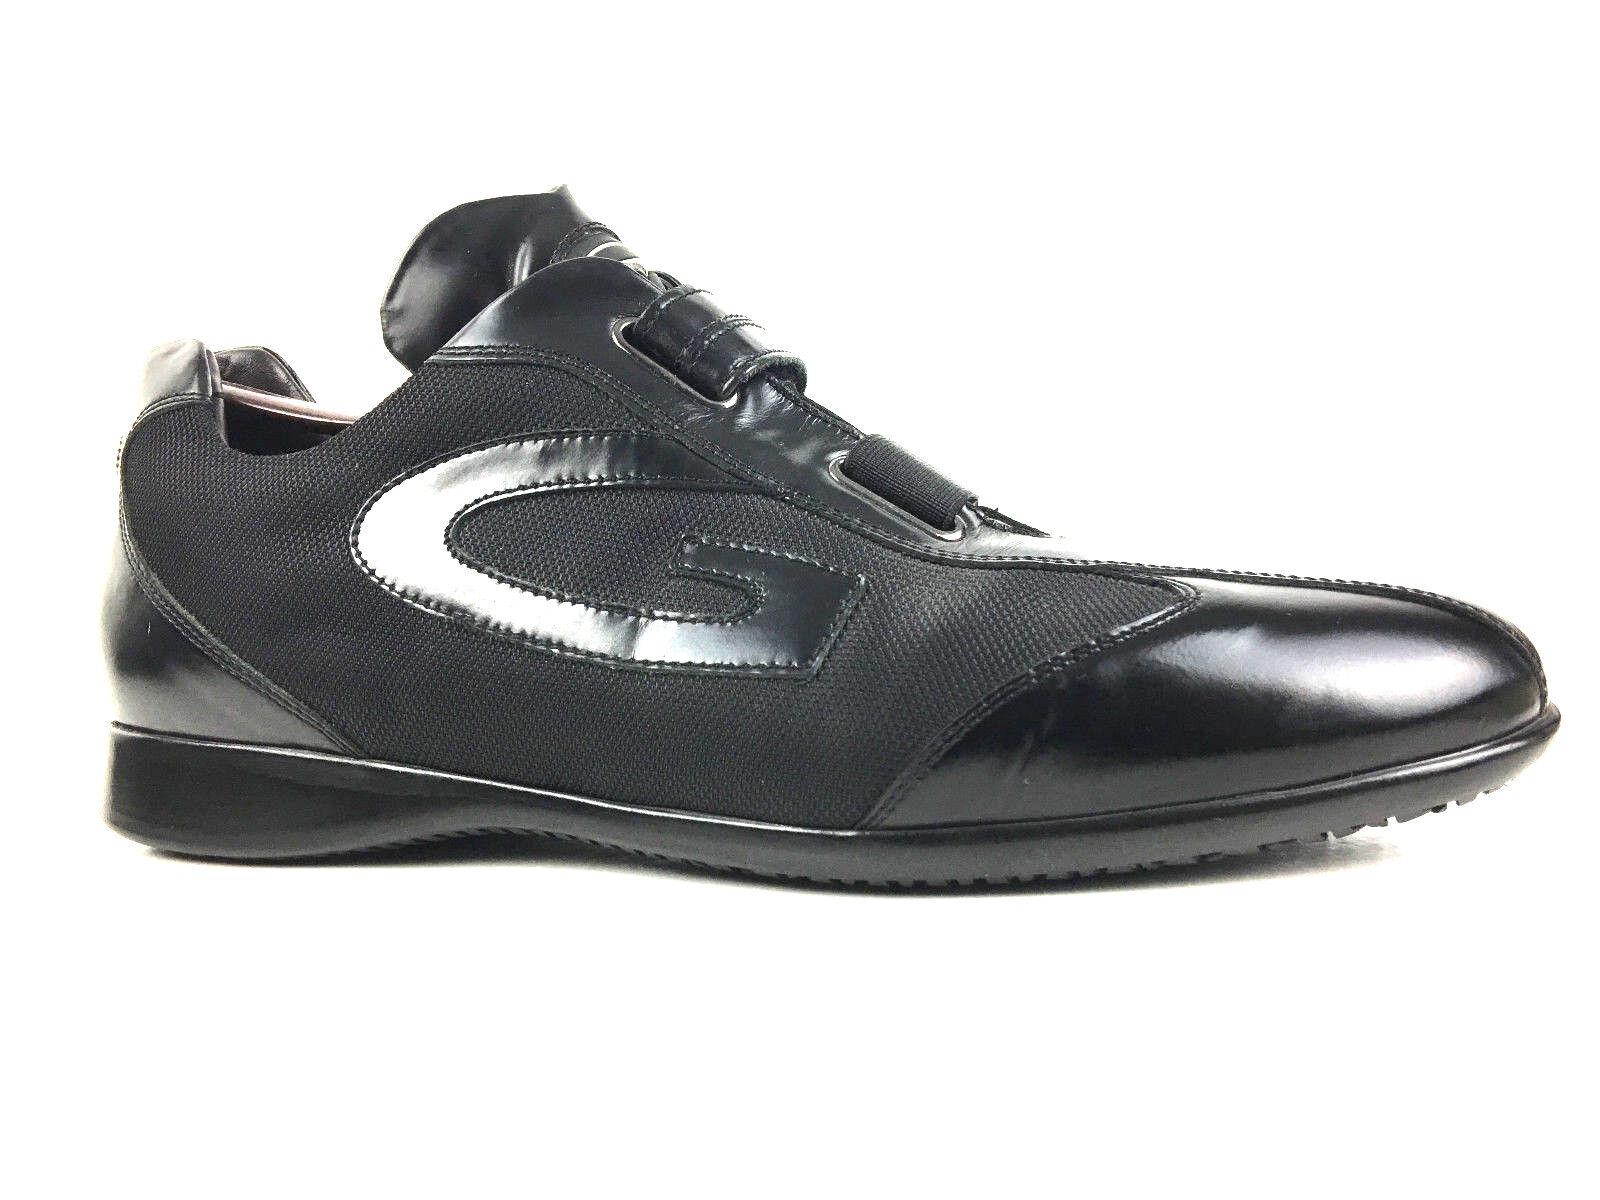 Alberto Ruben Italia Para Hombre Zapato de vestido negro talla US.11 UK.10.5 EUR.44